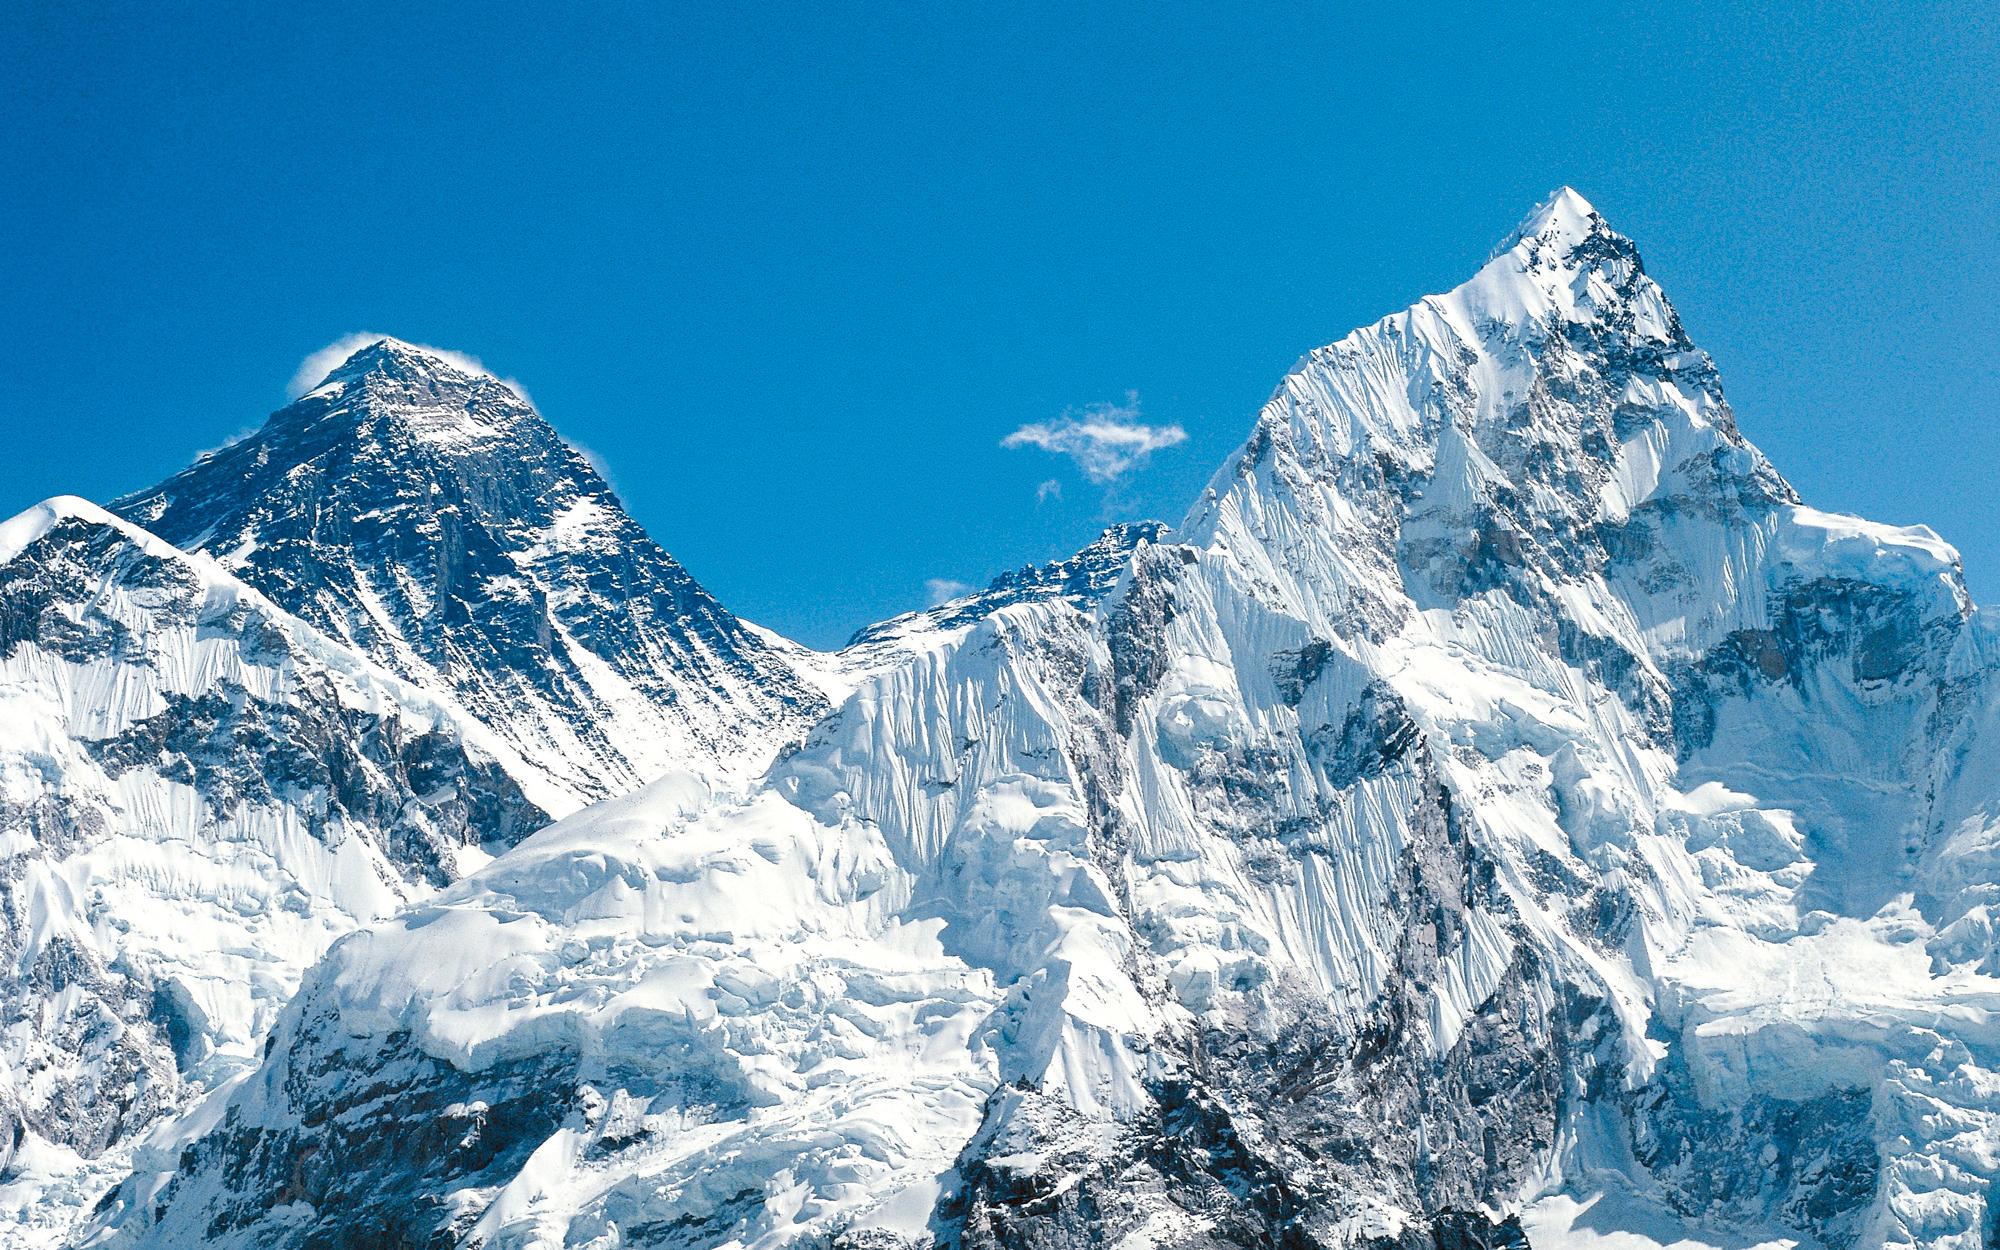 Mount-Everest-PEEKVIDEO0616